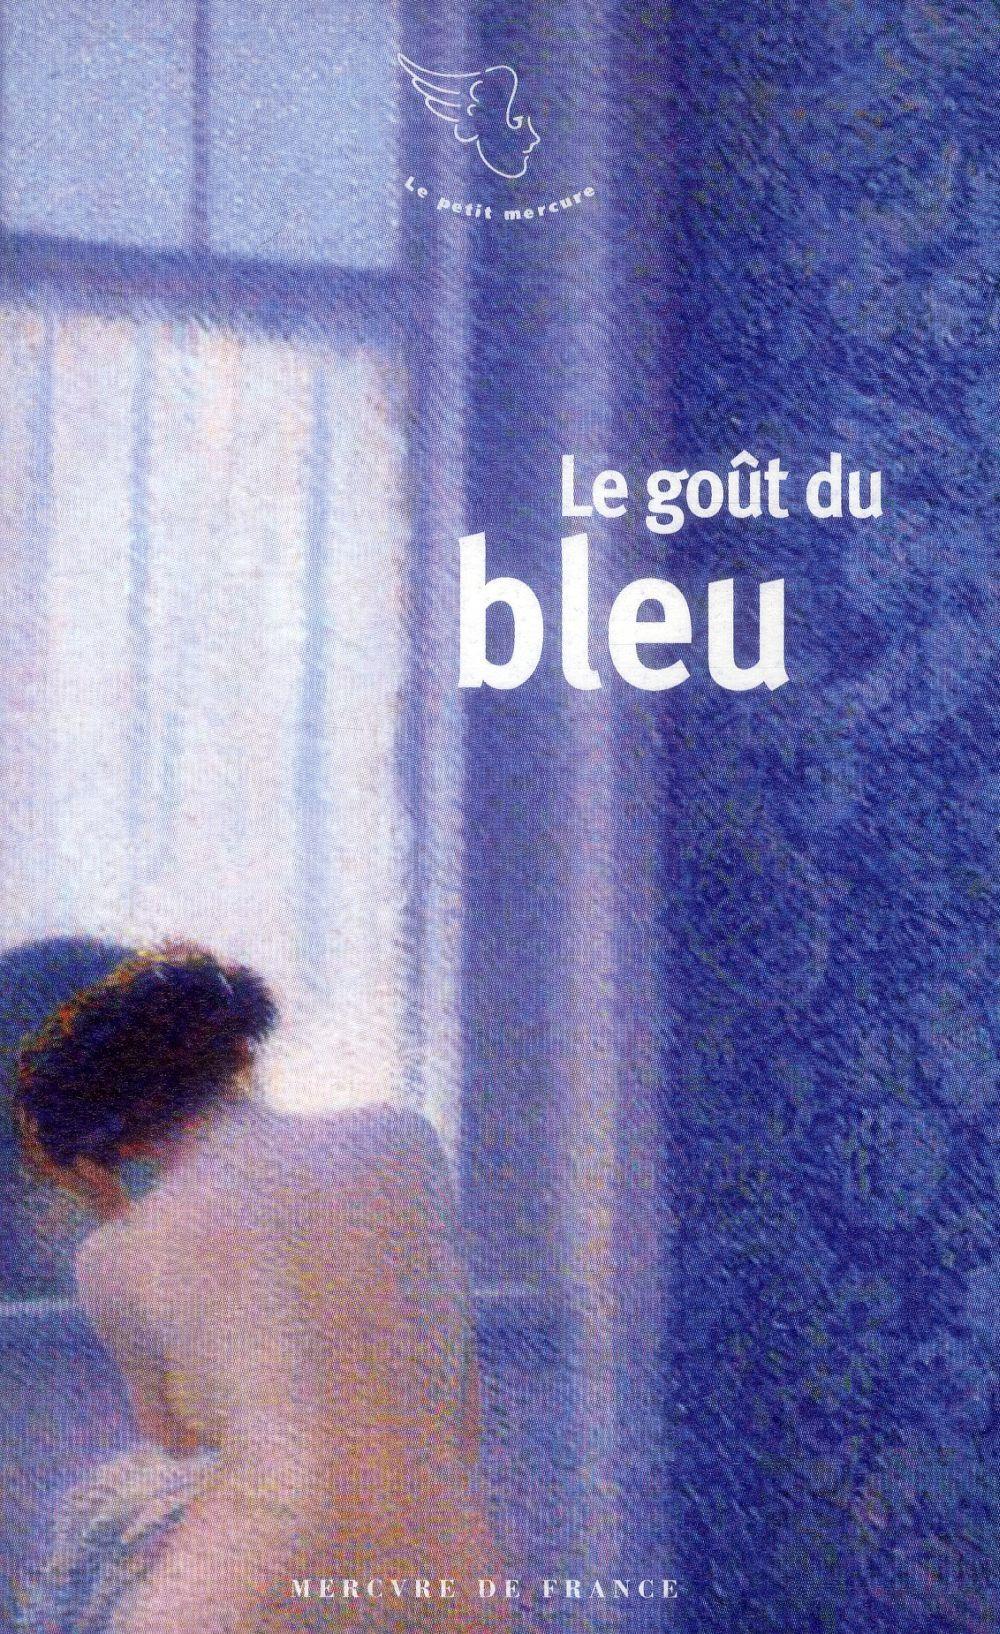 Le goût du bleu